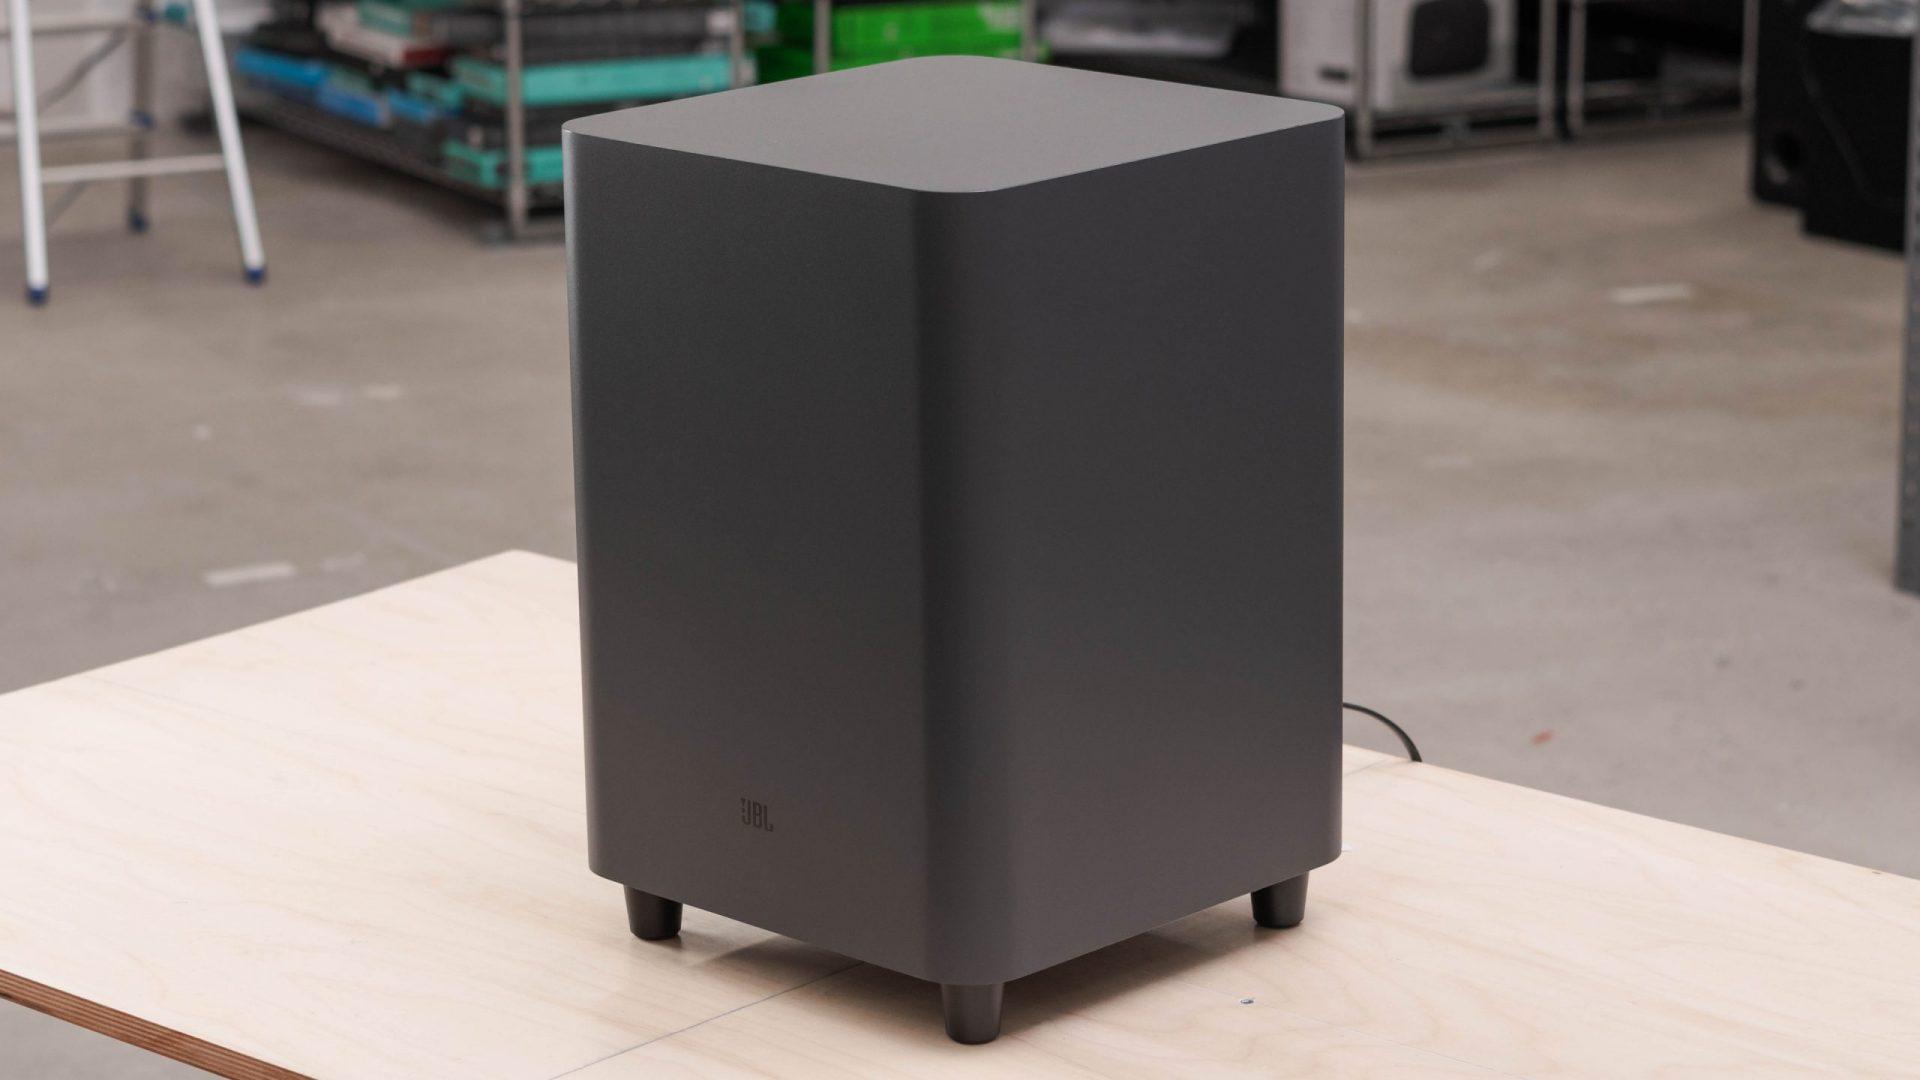 Loa thanh Soundbar JBL Bar 5.1 Surround loa sub